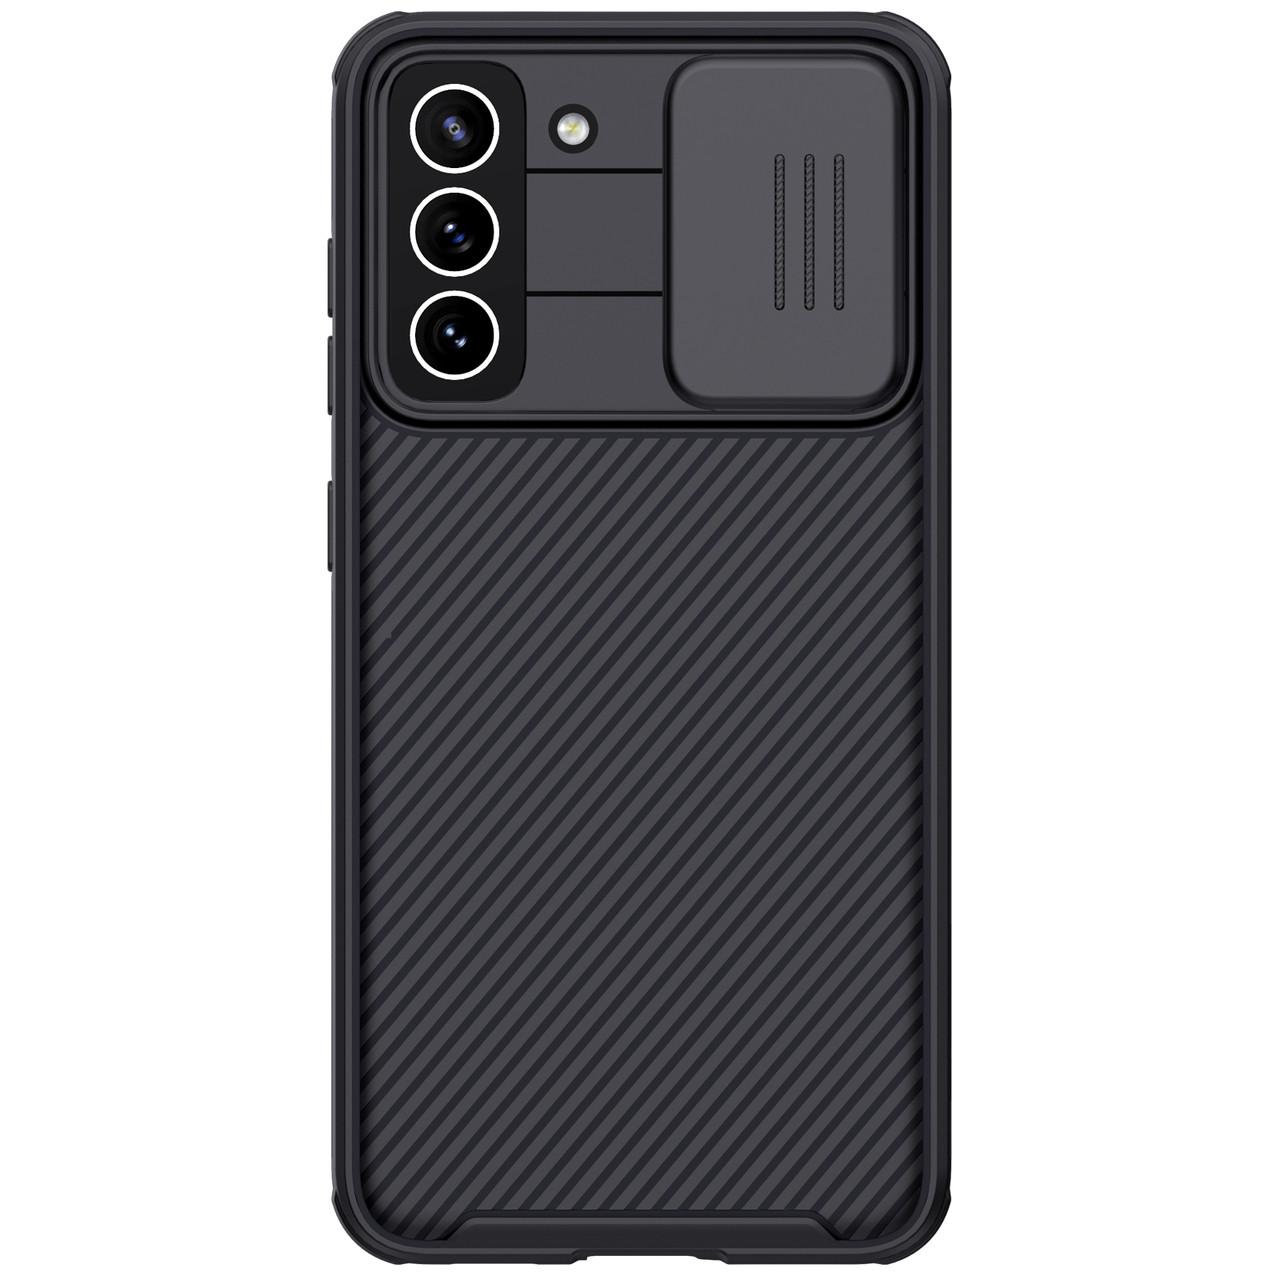 Защитный чехол Nillkin для Samsung Galaxy S21 FE 2021 (CamShield Pro Case) Black с защитой камеры